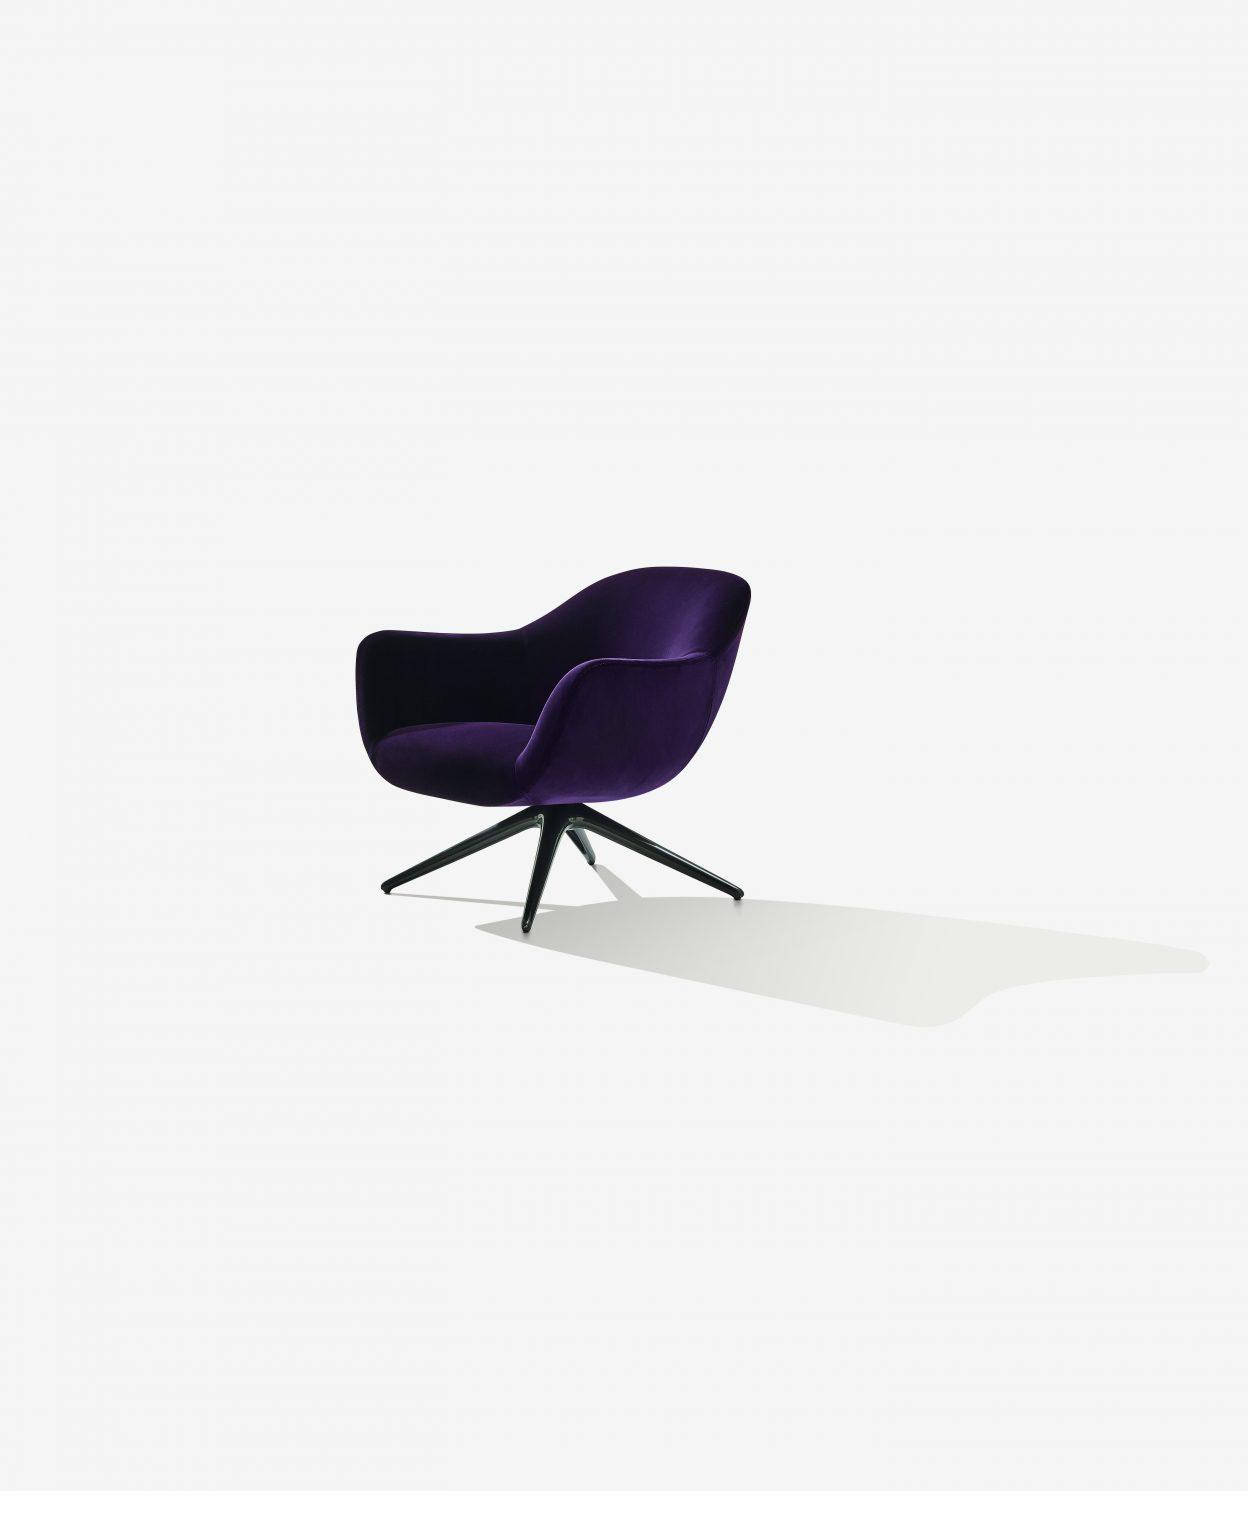 Biennale Interieur - Belgium's leading design and interior event - Poltrone-mad-chair-con-razza-v1-185.jpg